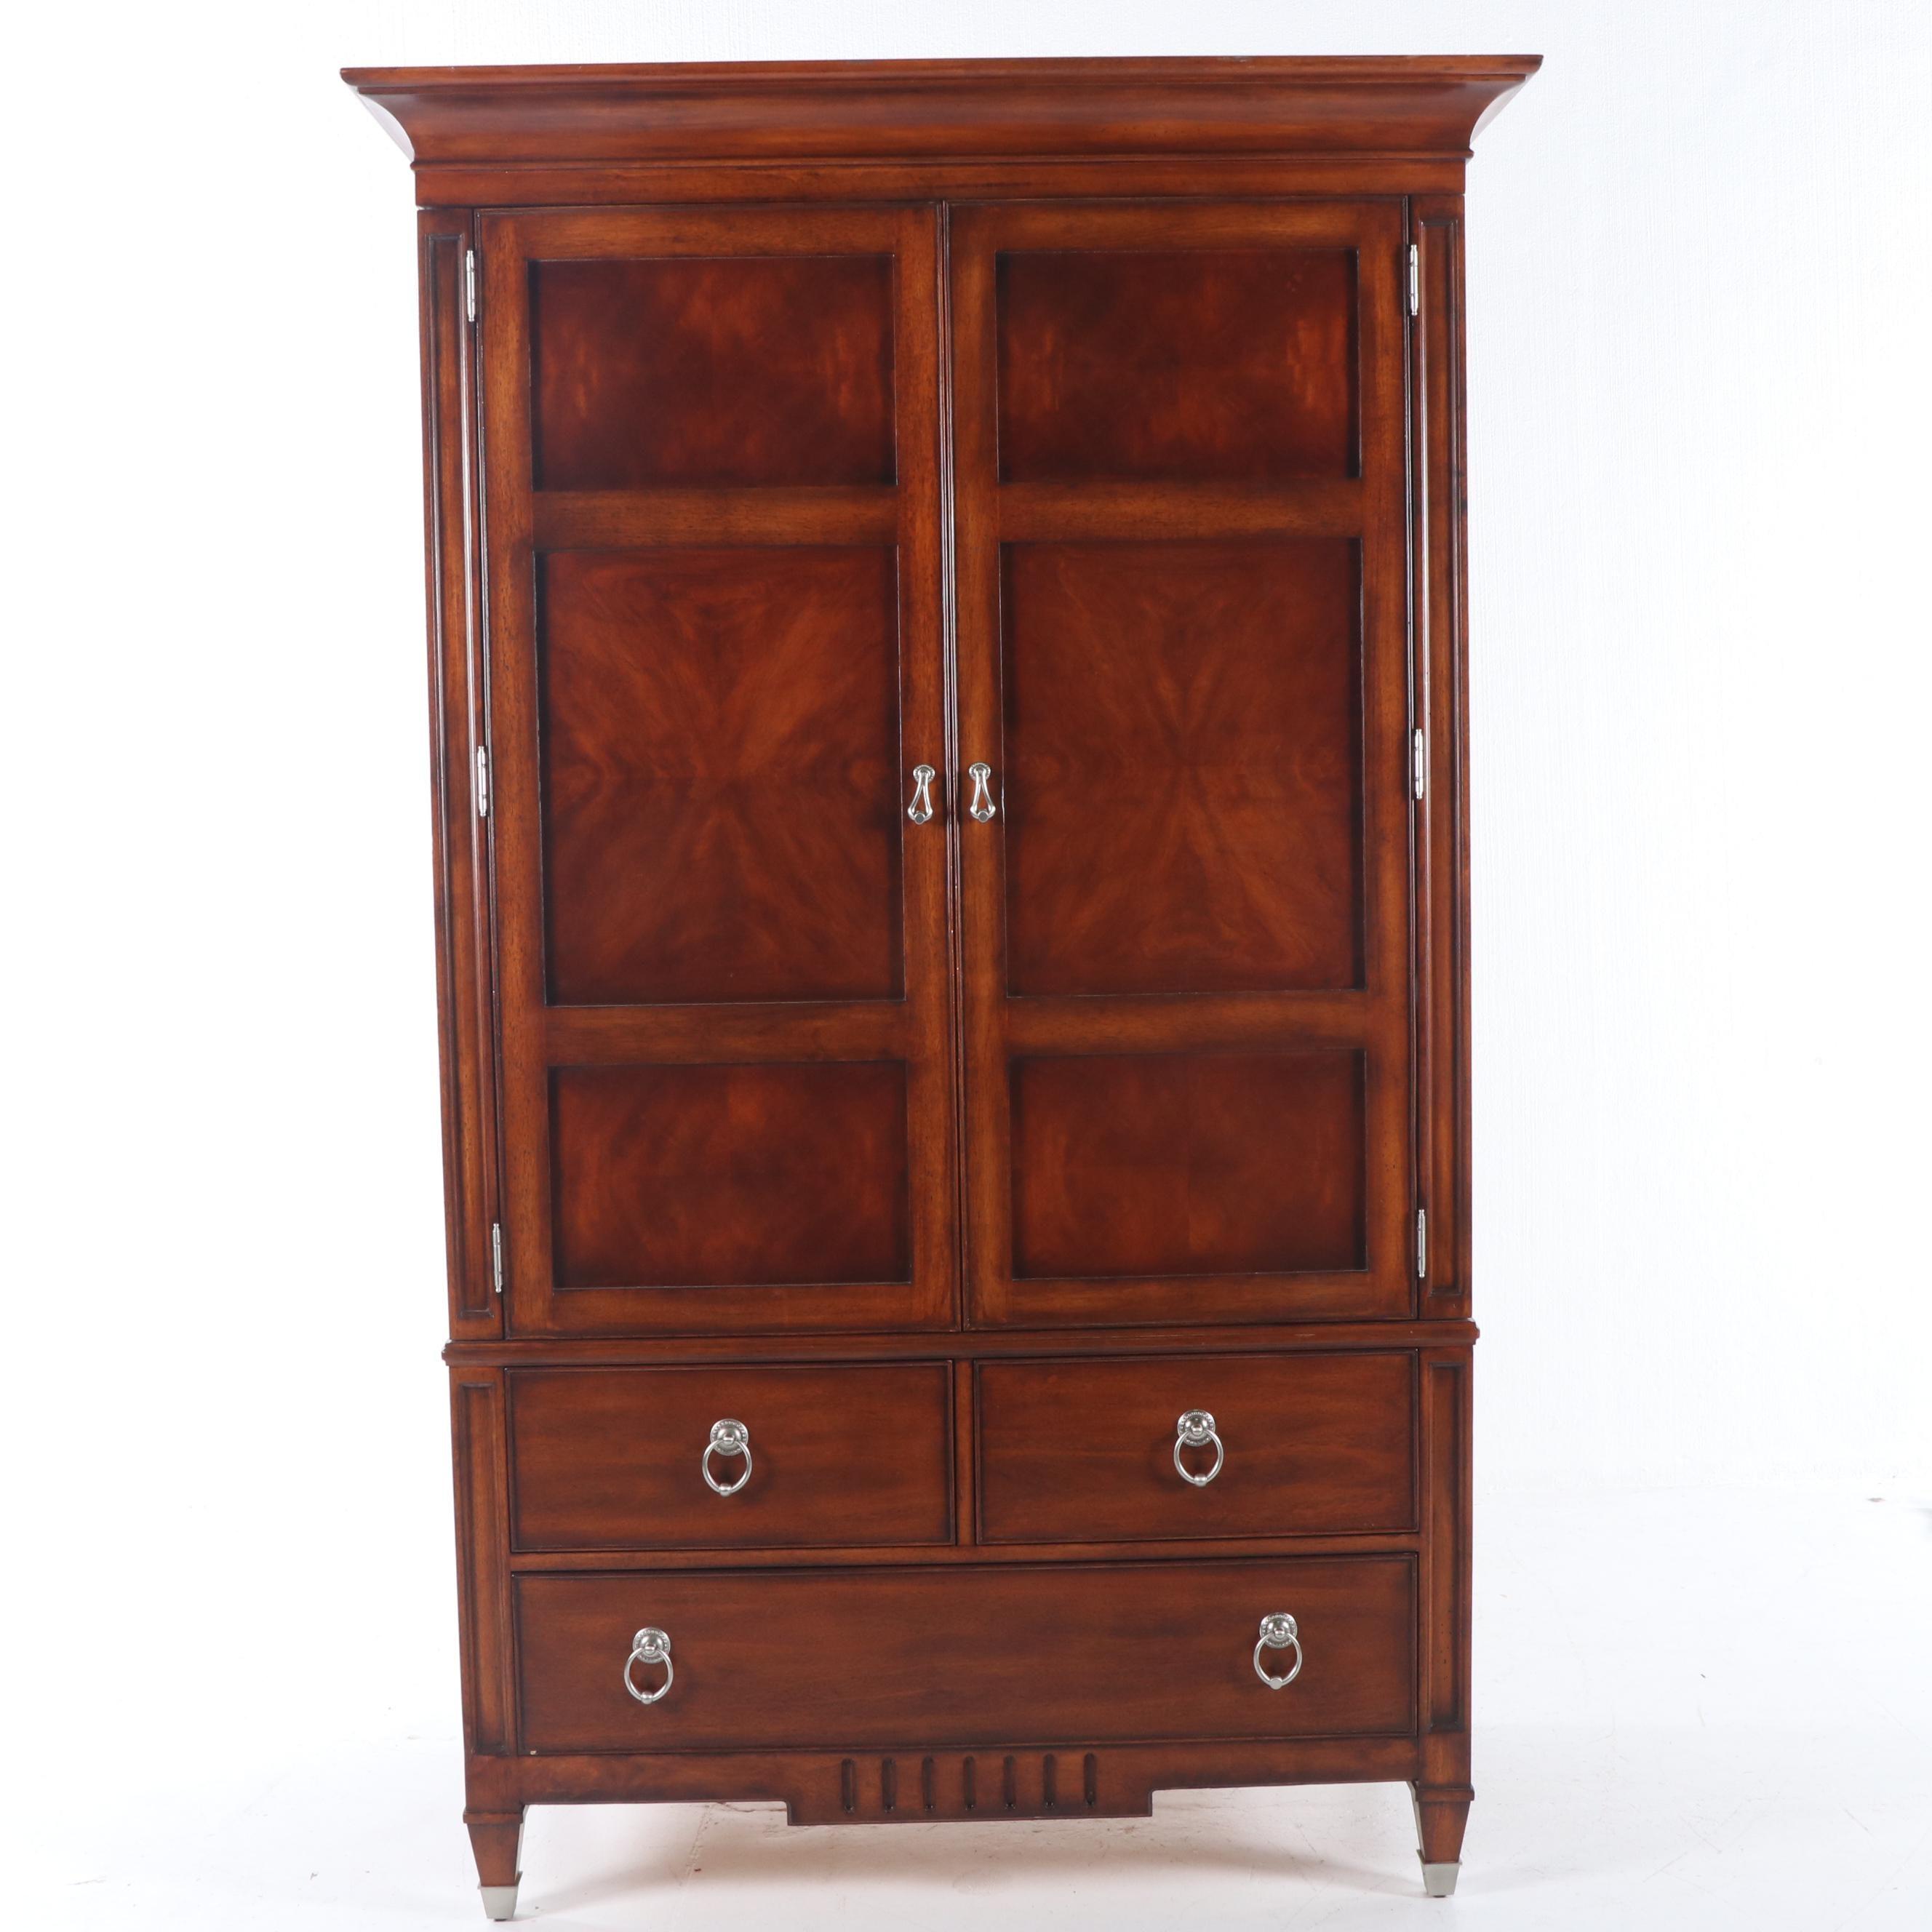 Federal Style Burl Wood Veneer Armoire by Liz Claiborne, 21st Century